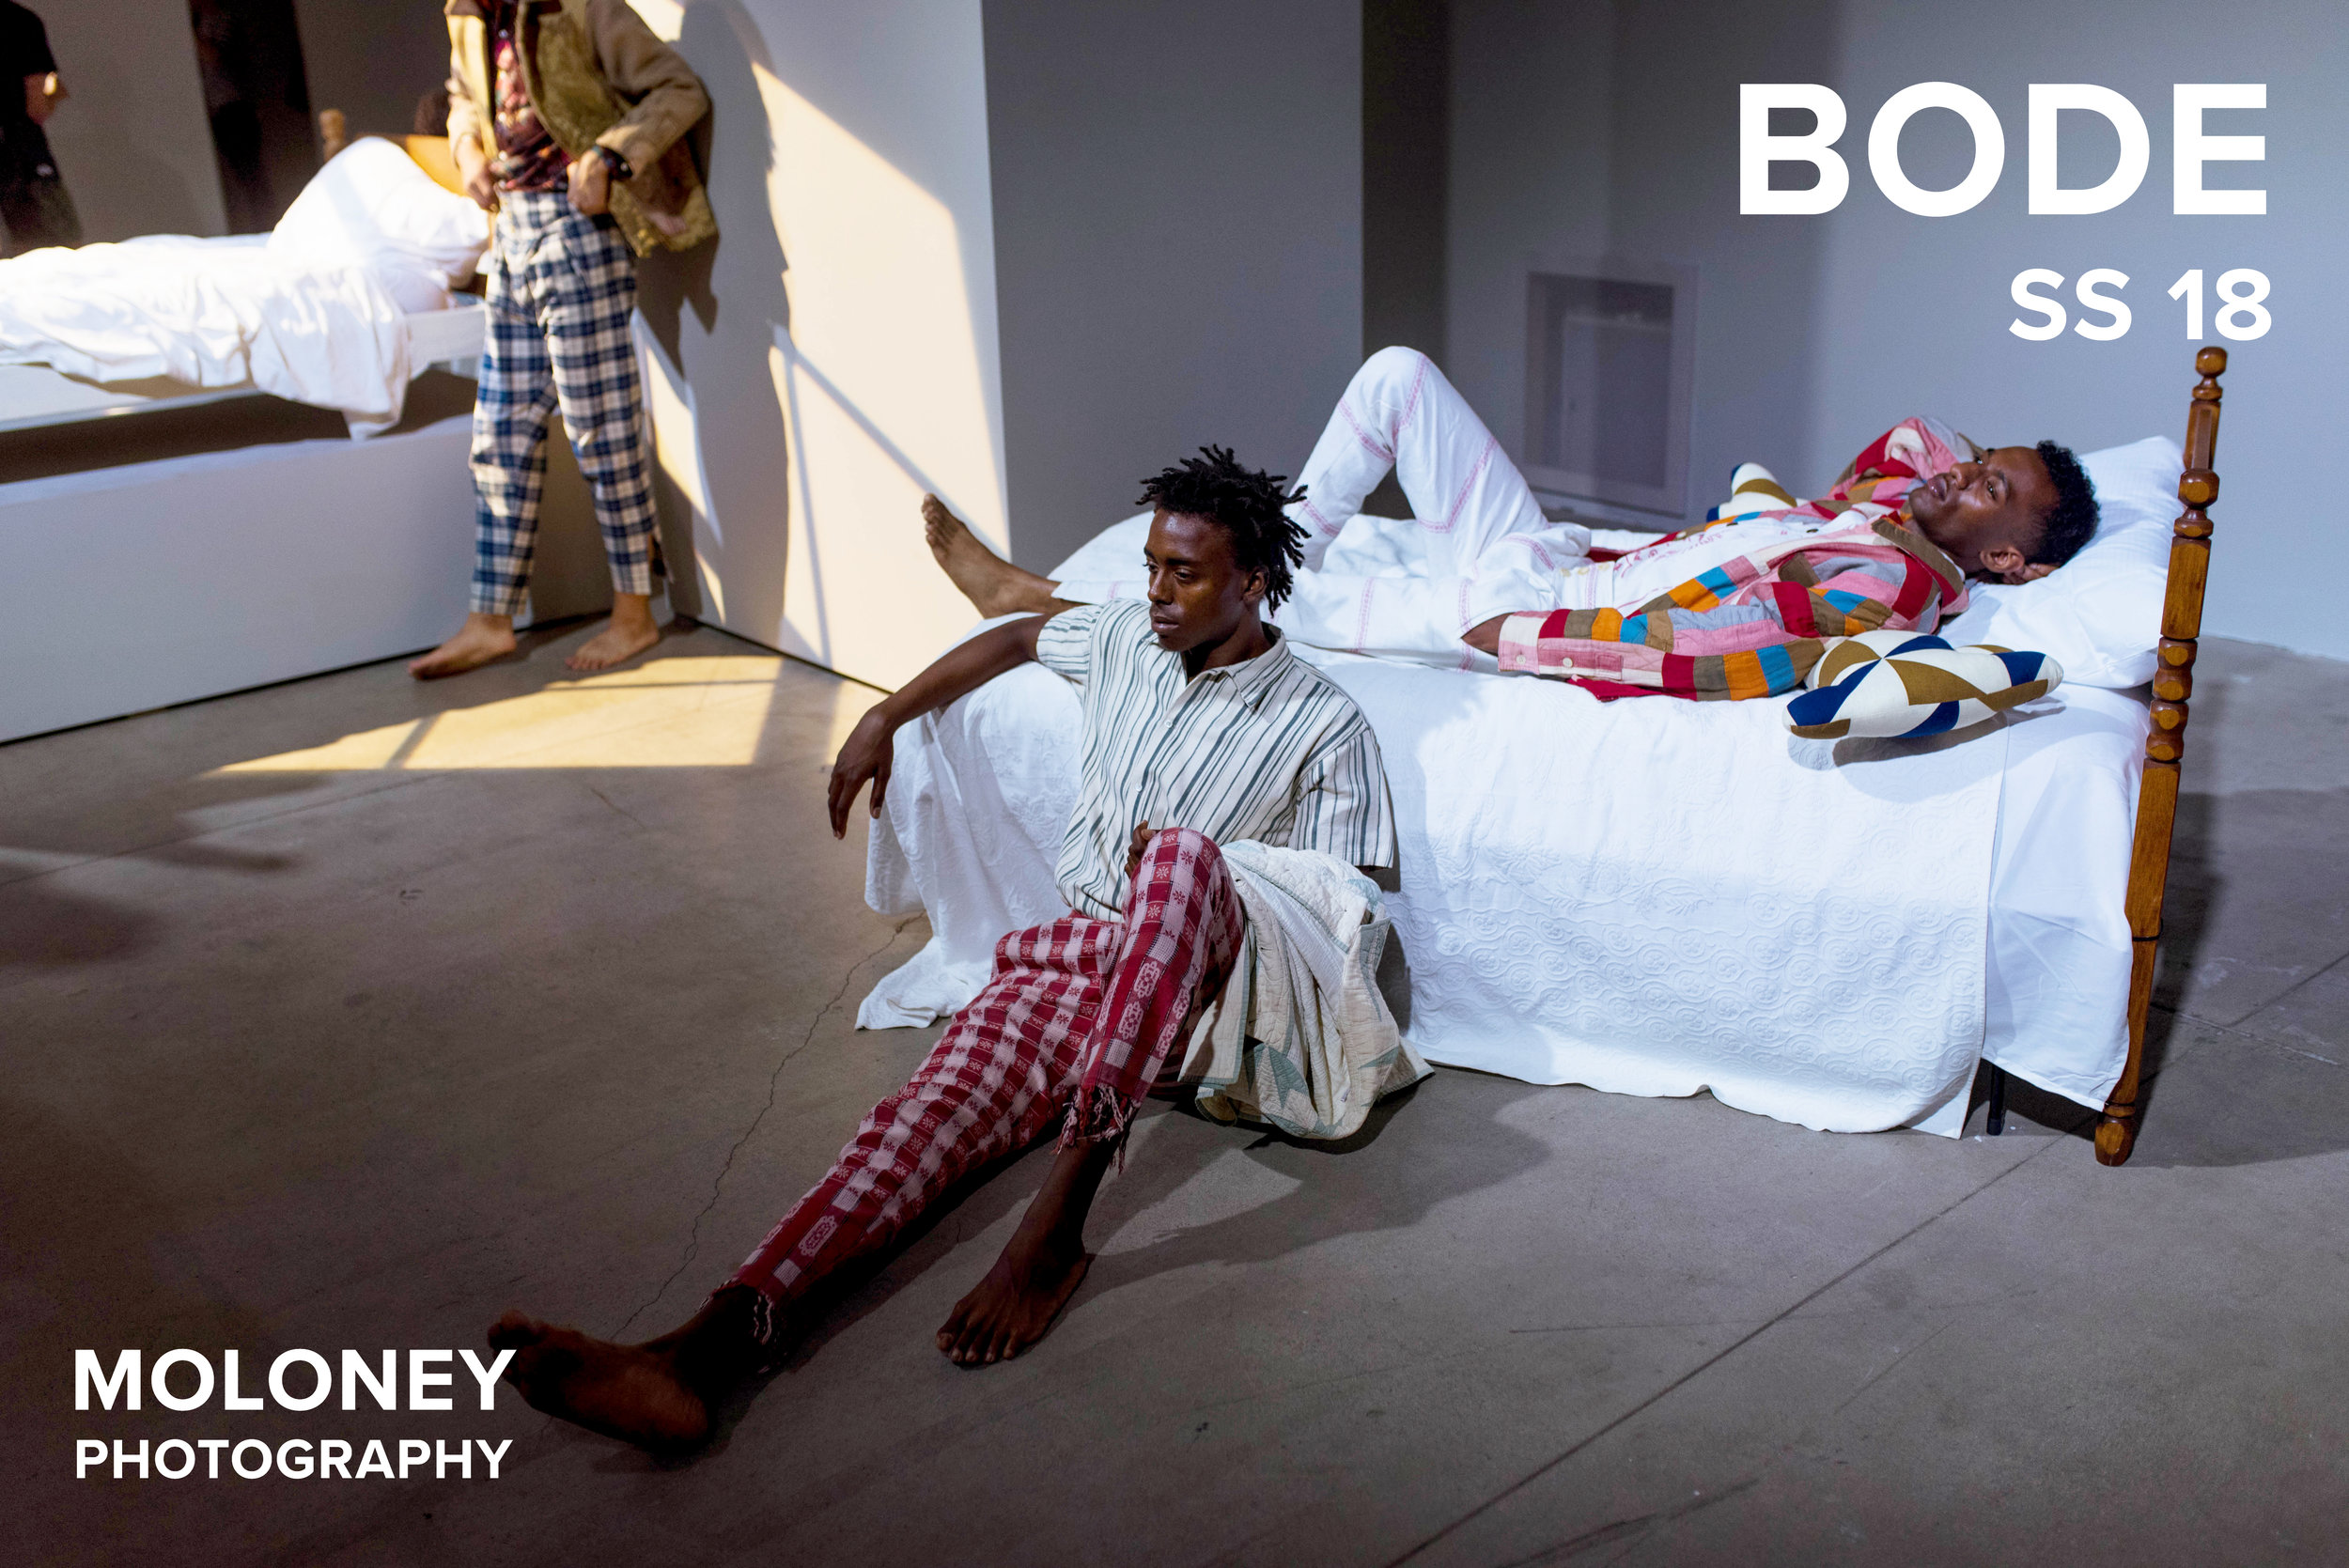 Bode SS 18 (1) - Moloney Photography.jpg